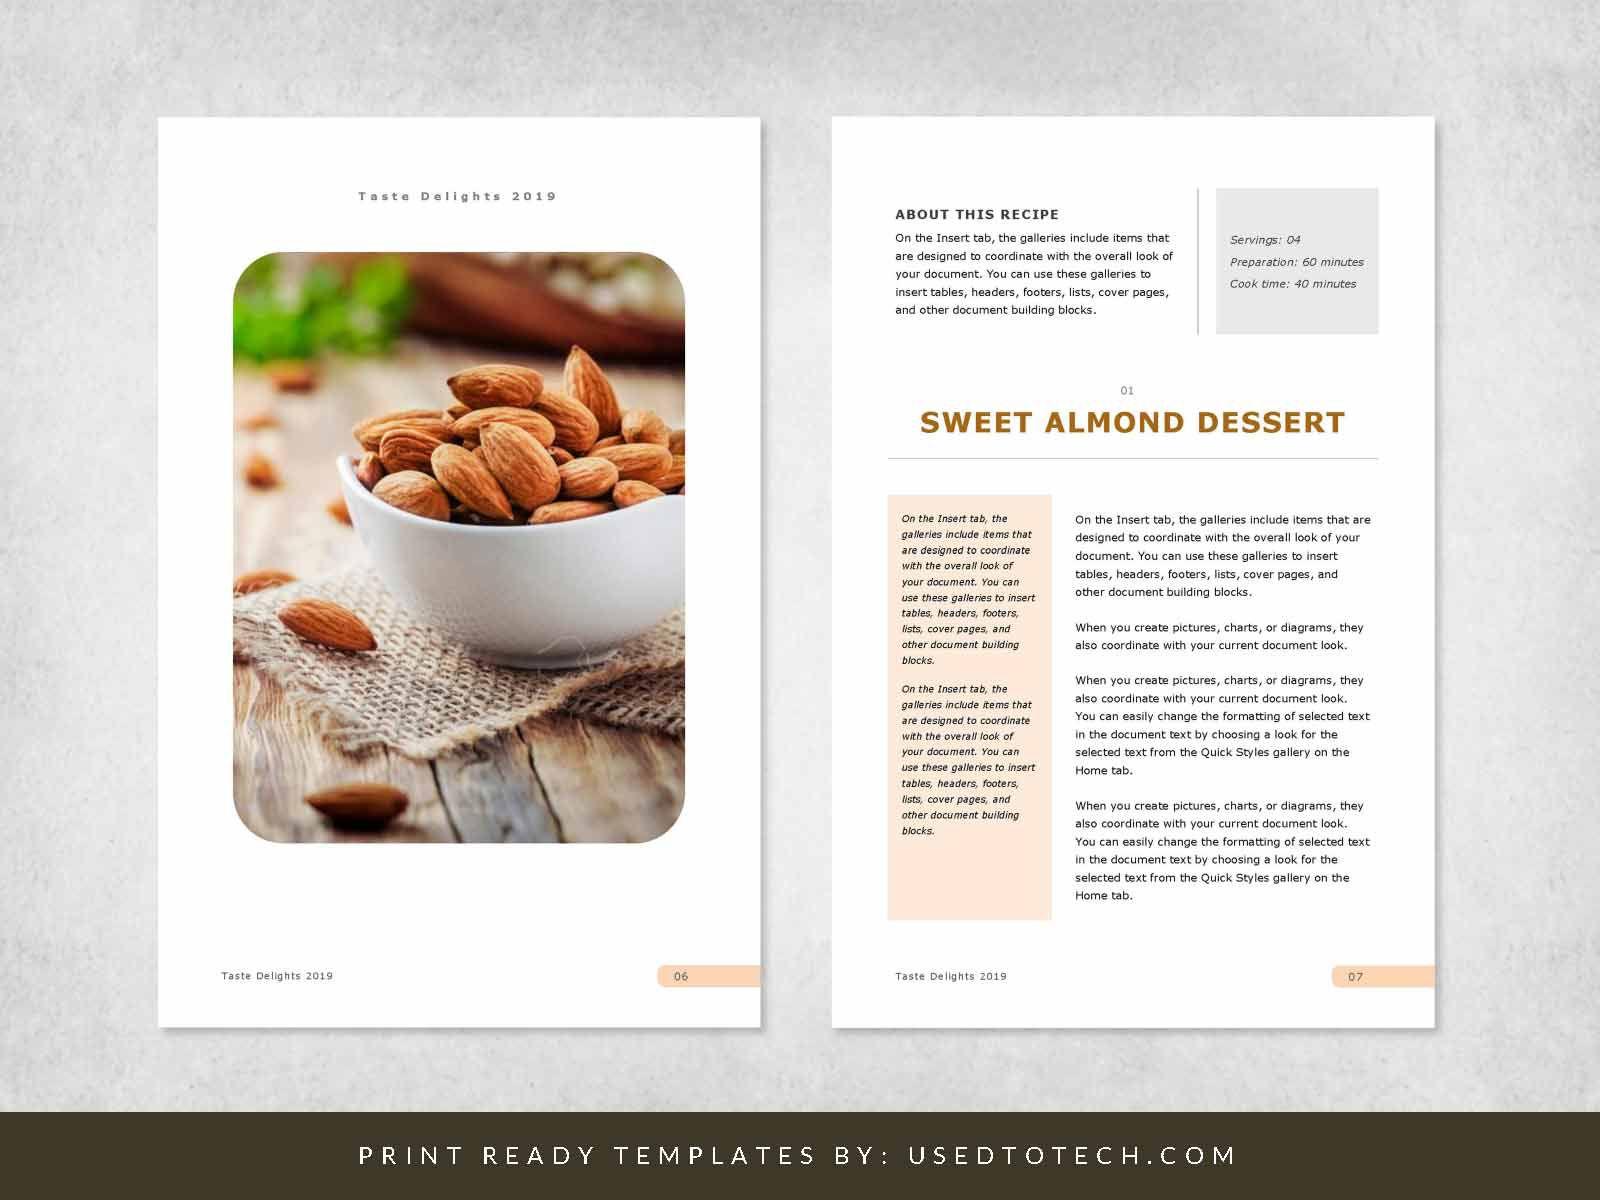 001 Astounding Recipe Book Template Word Photo  Mac Free MicrosoftFull